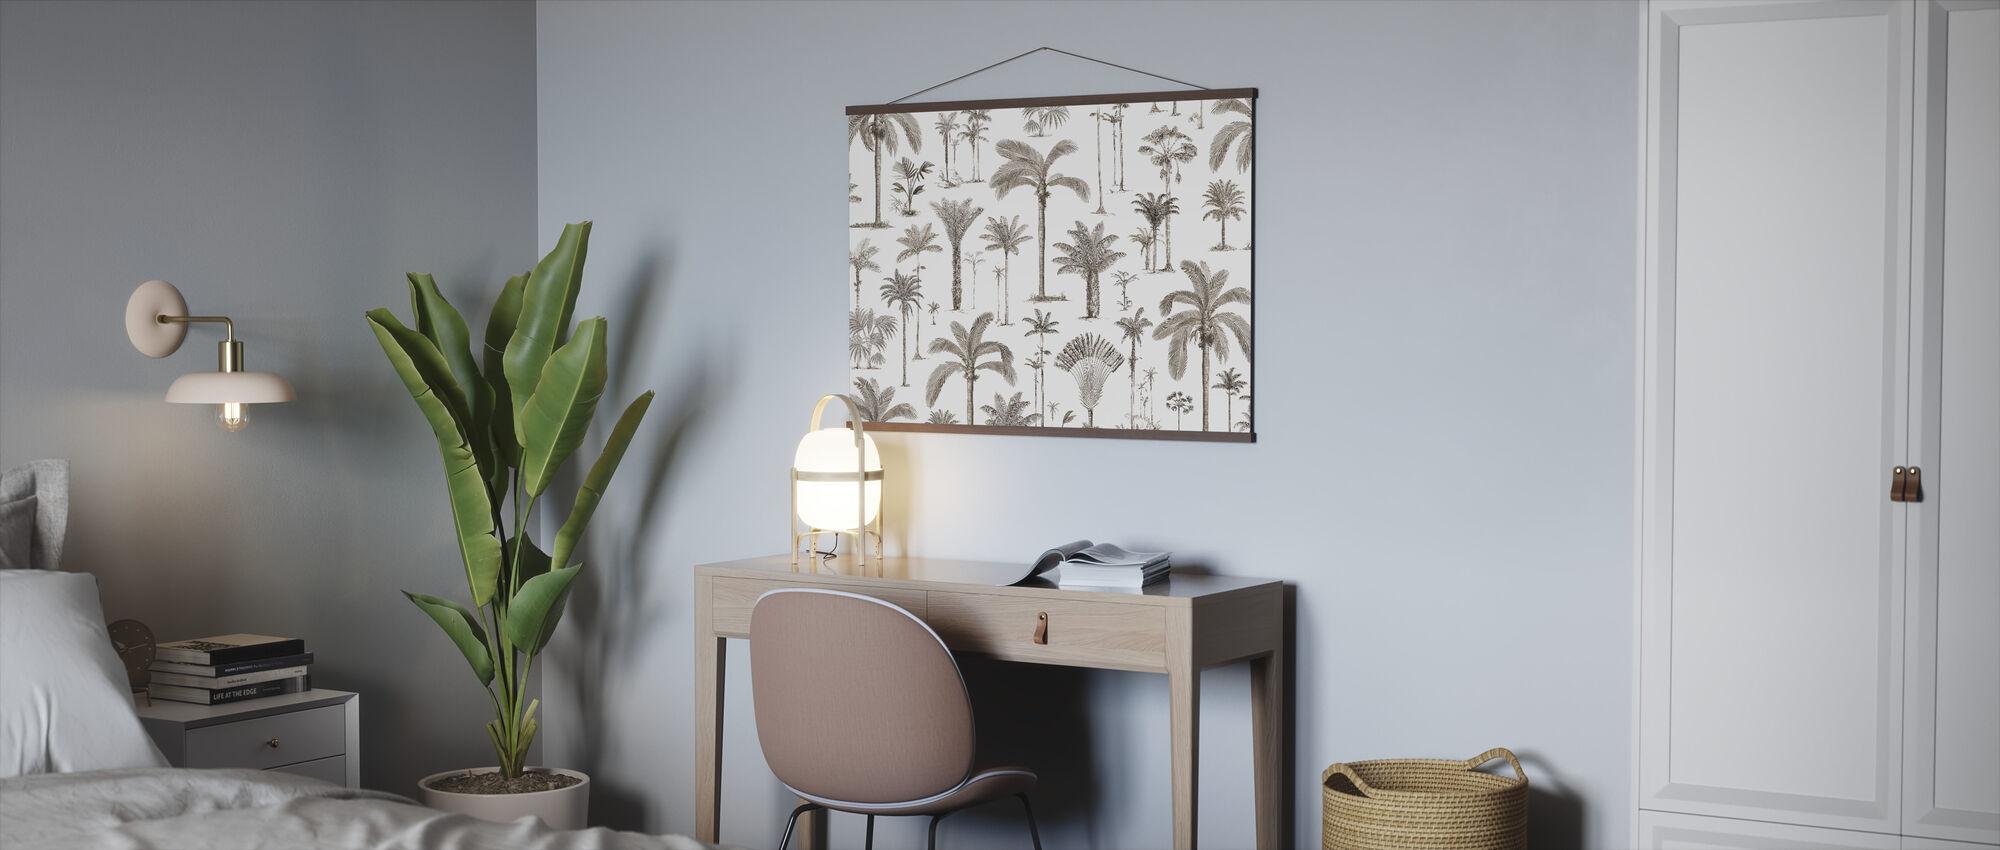 Brasilianska palmer - Sepia - Poster - Kontor